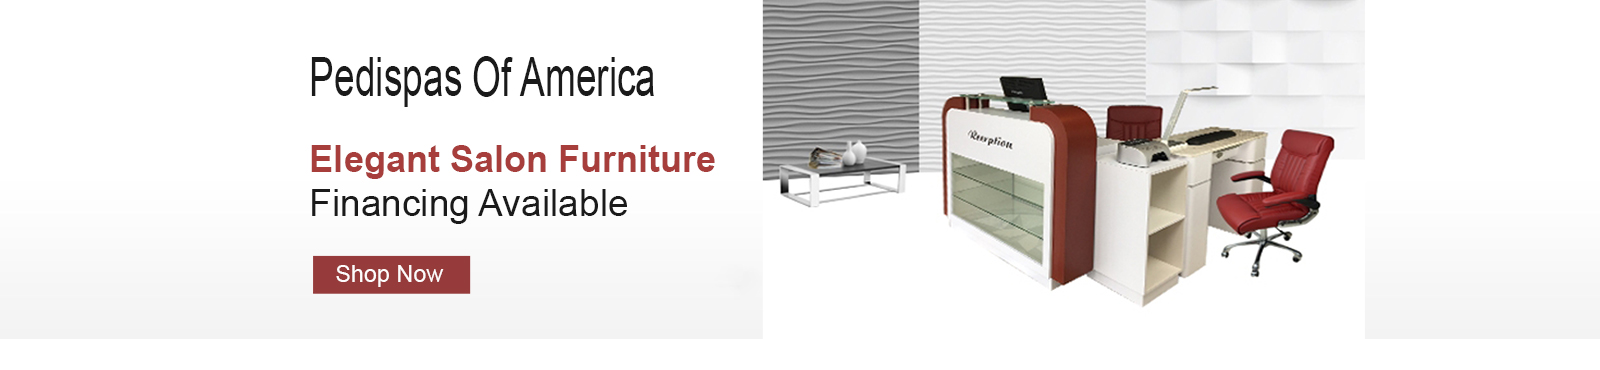 Pedispa Of America salon furniture with financing program